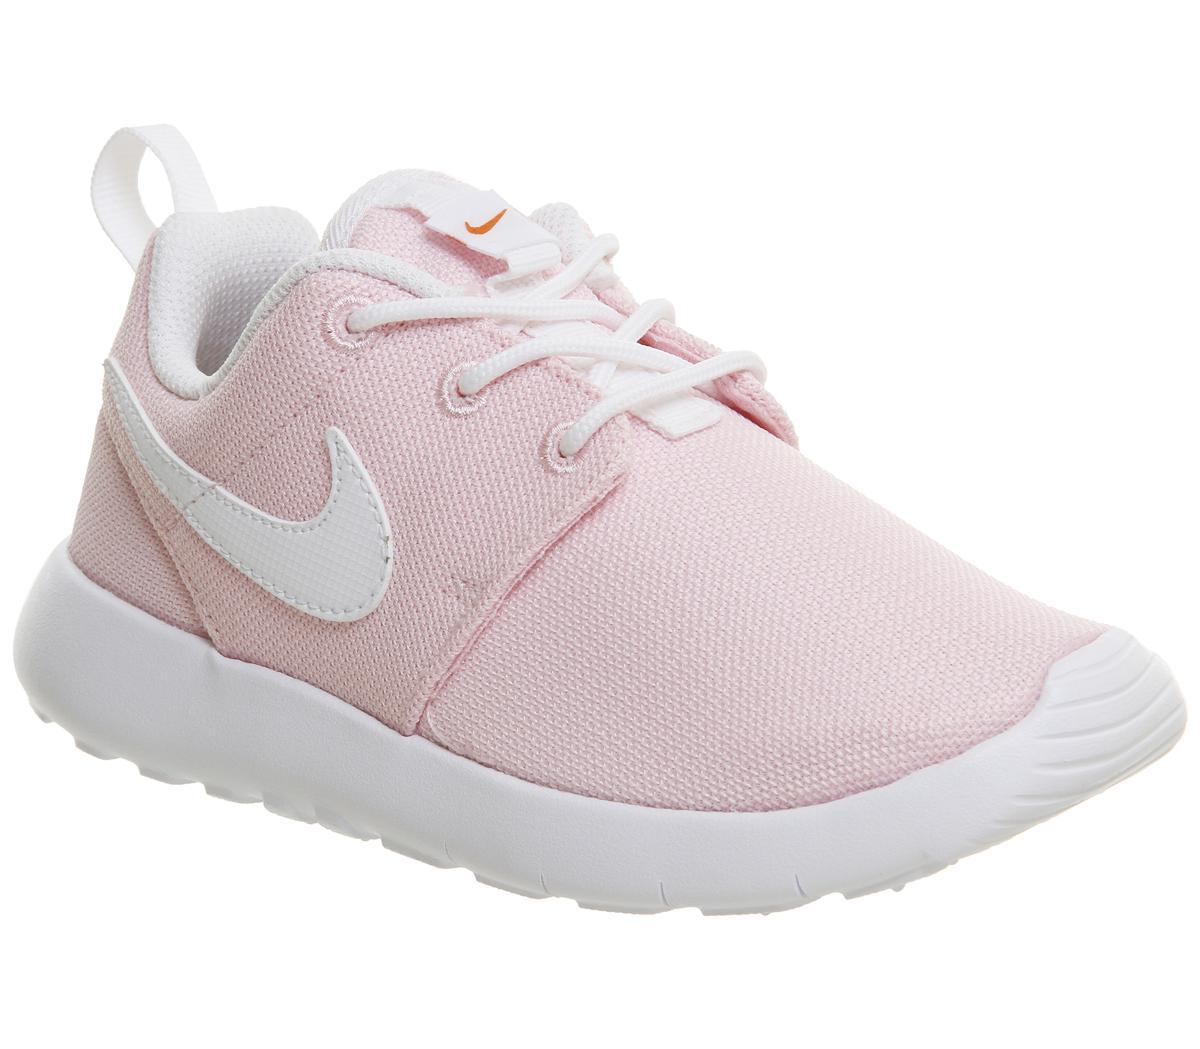 costilla alojamiento Ceder el paso  Nike Roshe Run Ps Prism Pink White Safety Orange - Unisex